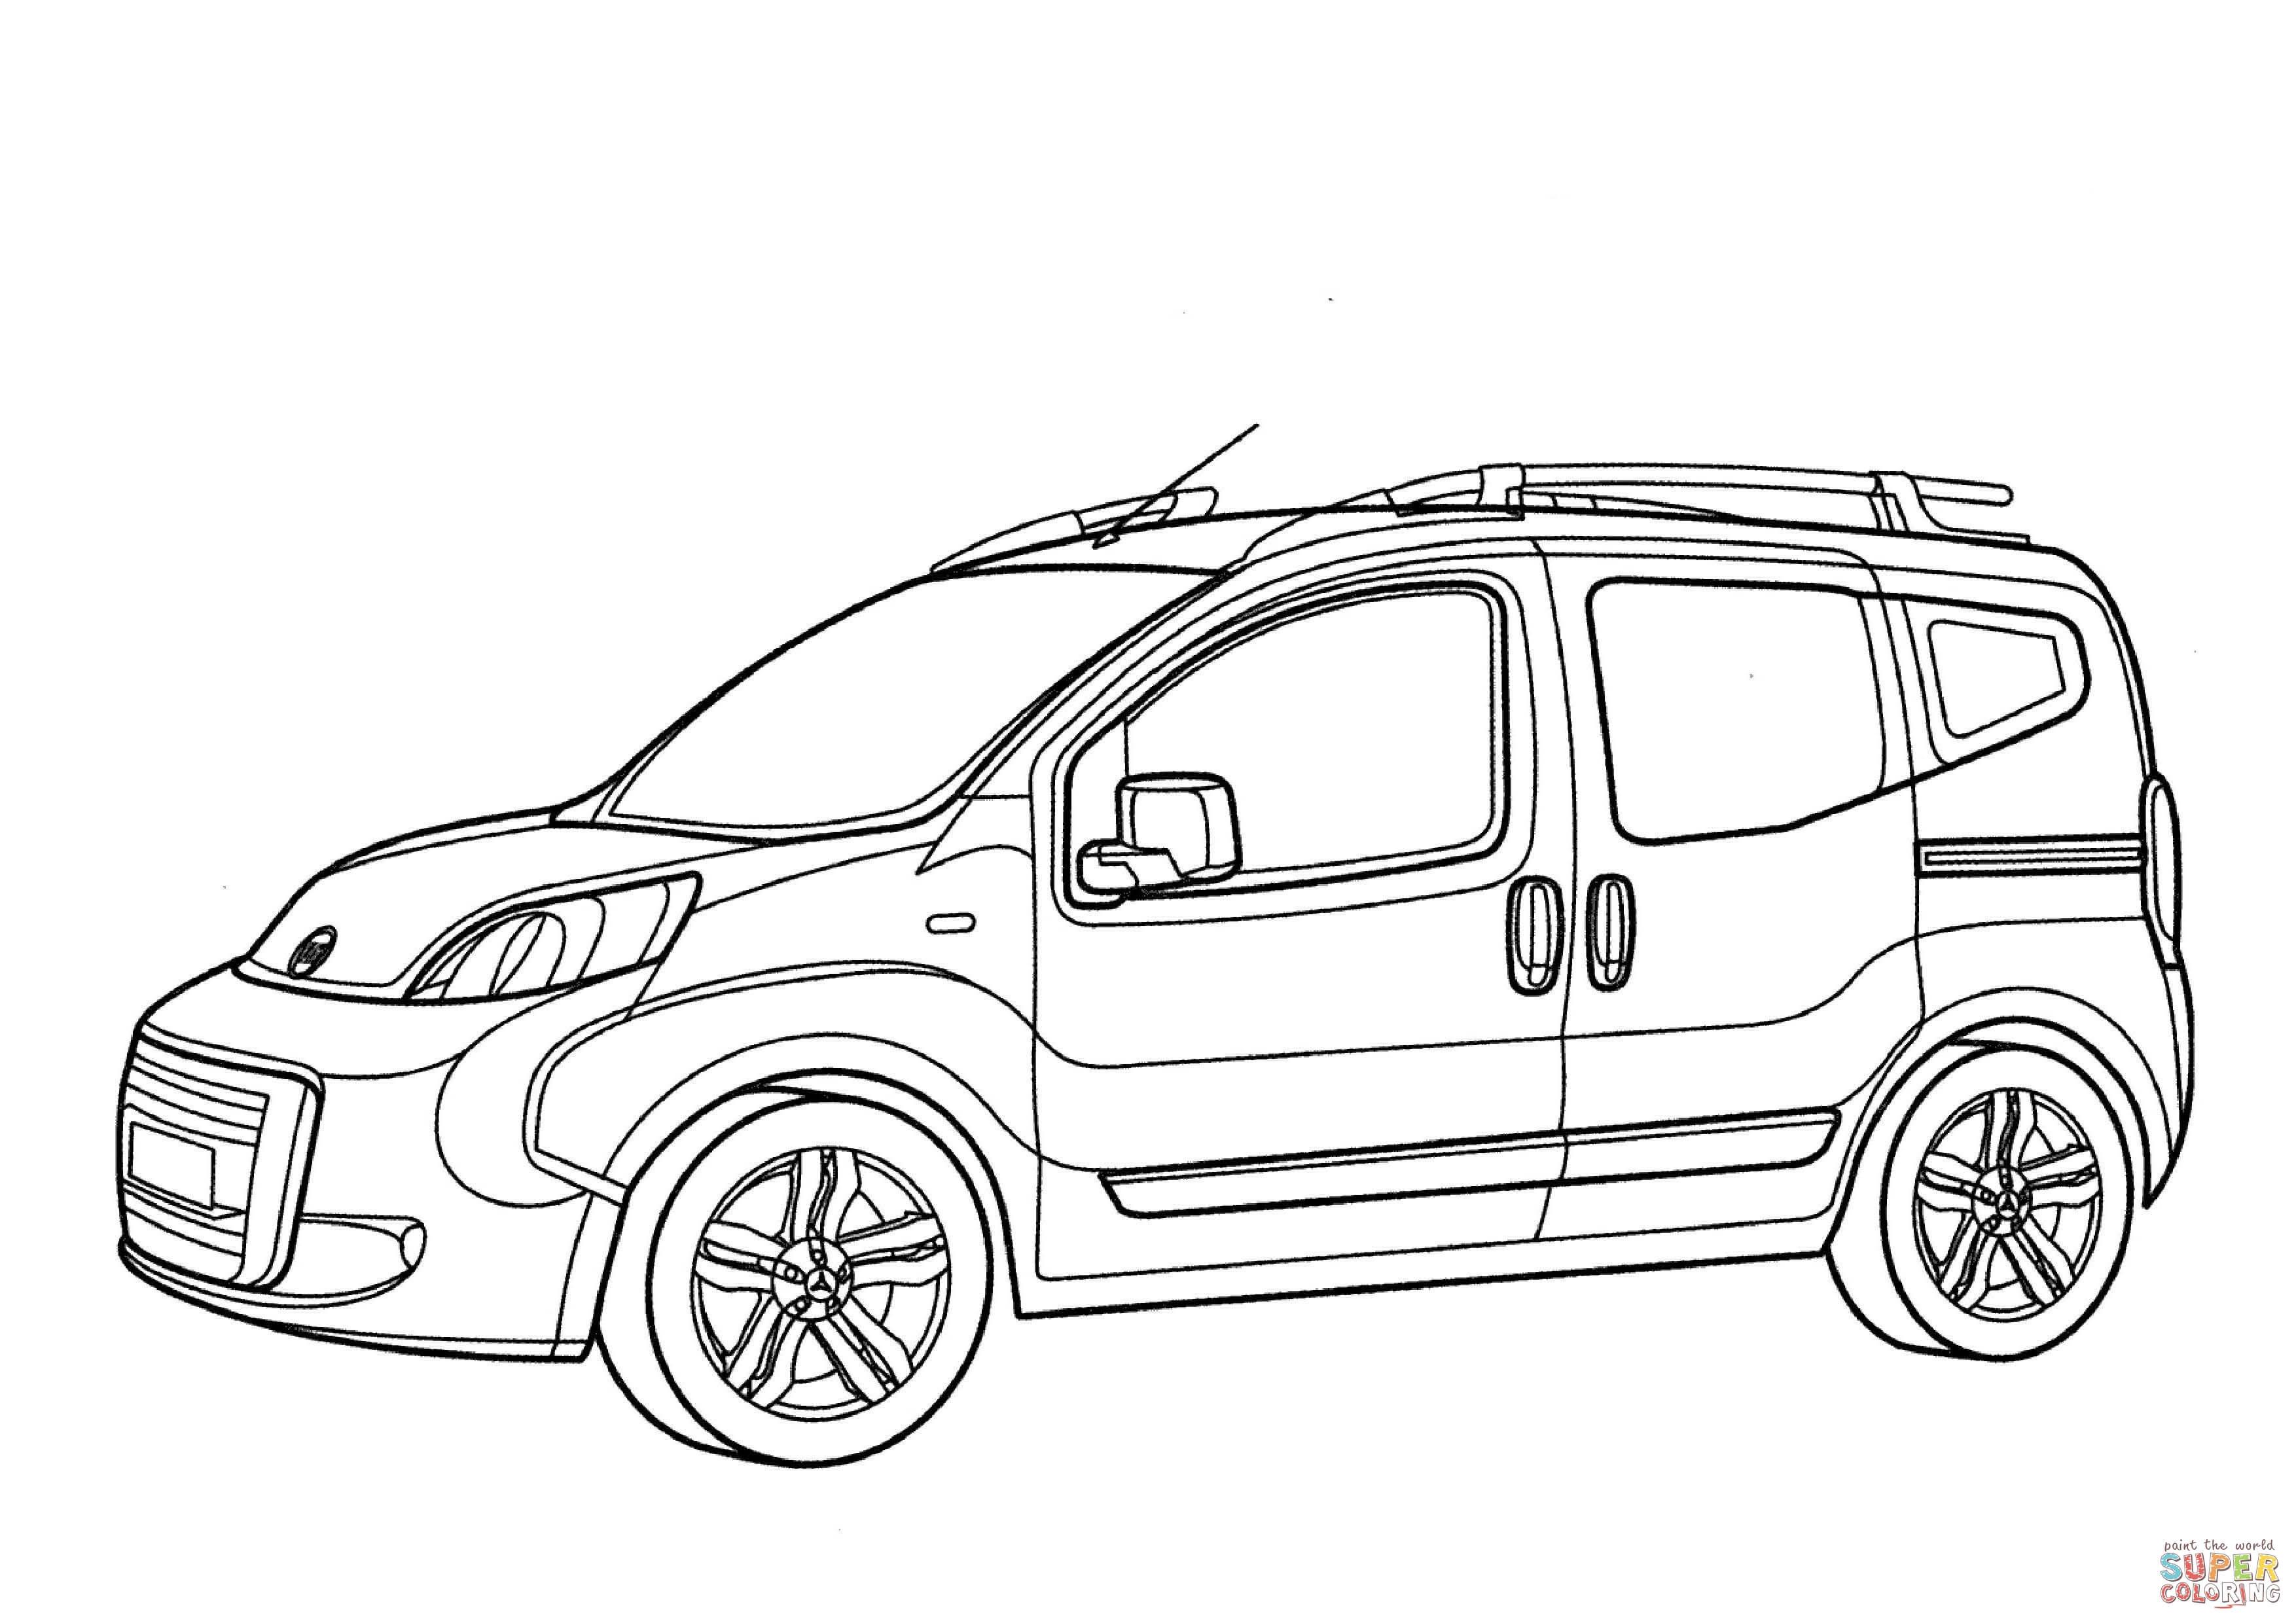 2009 Fiat Panda 100hp General Fuse Box Diagram